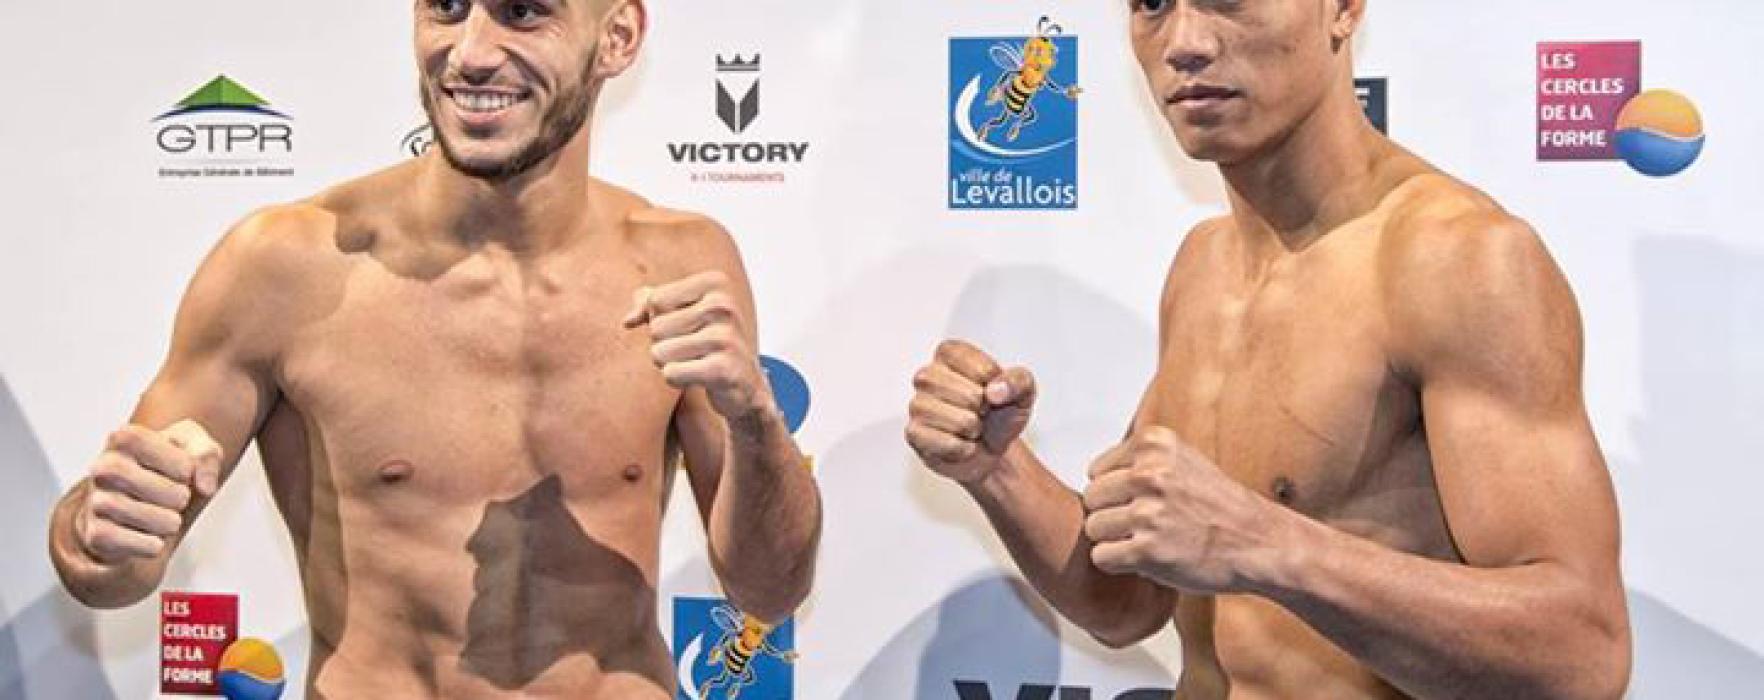 Risultati: Sitthichai Sitsongpeenong batte Dylan Salvador – Victory Sports League – Parigi – 13 Dic 2014